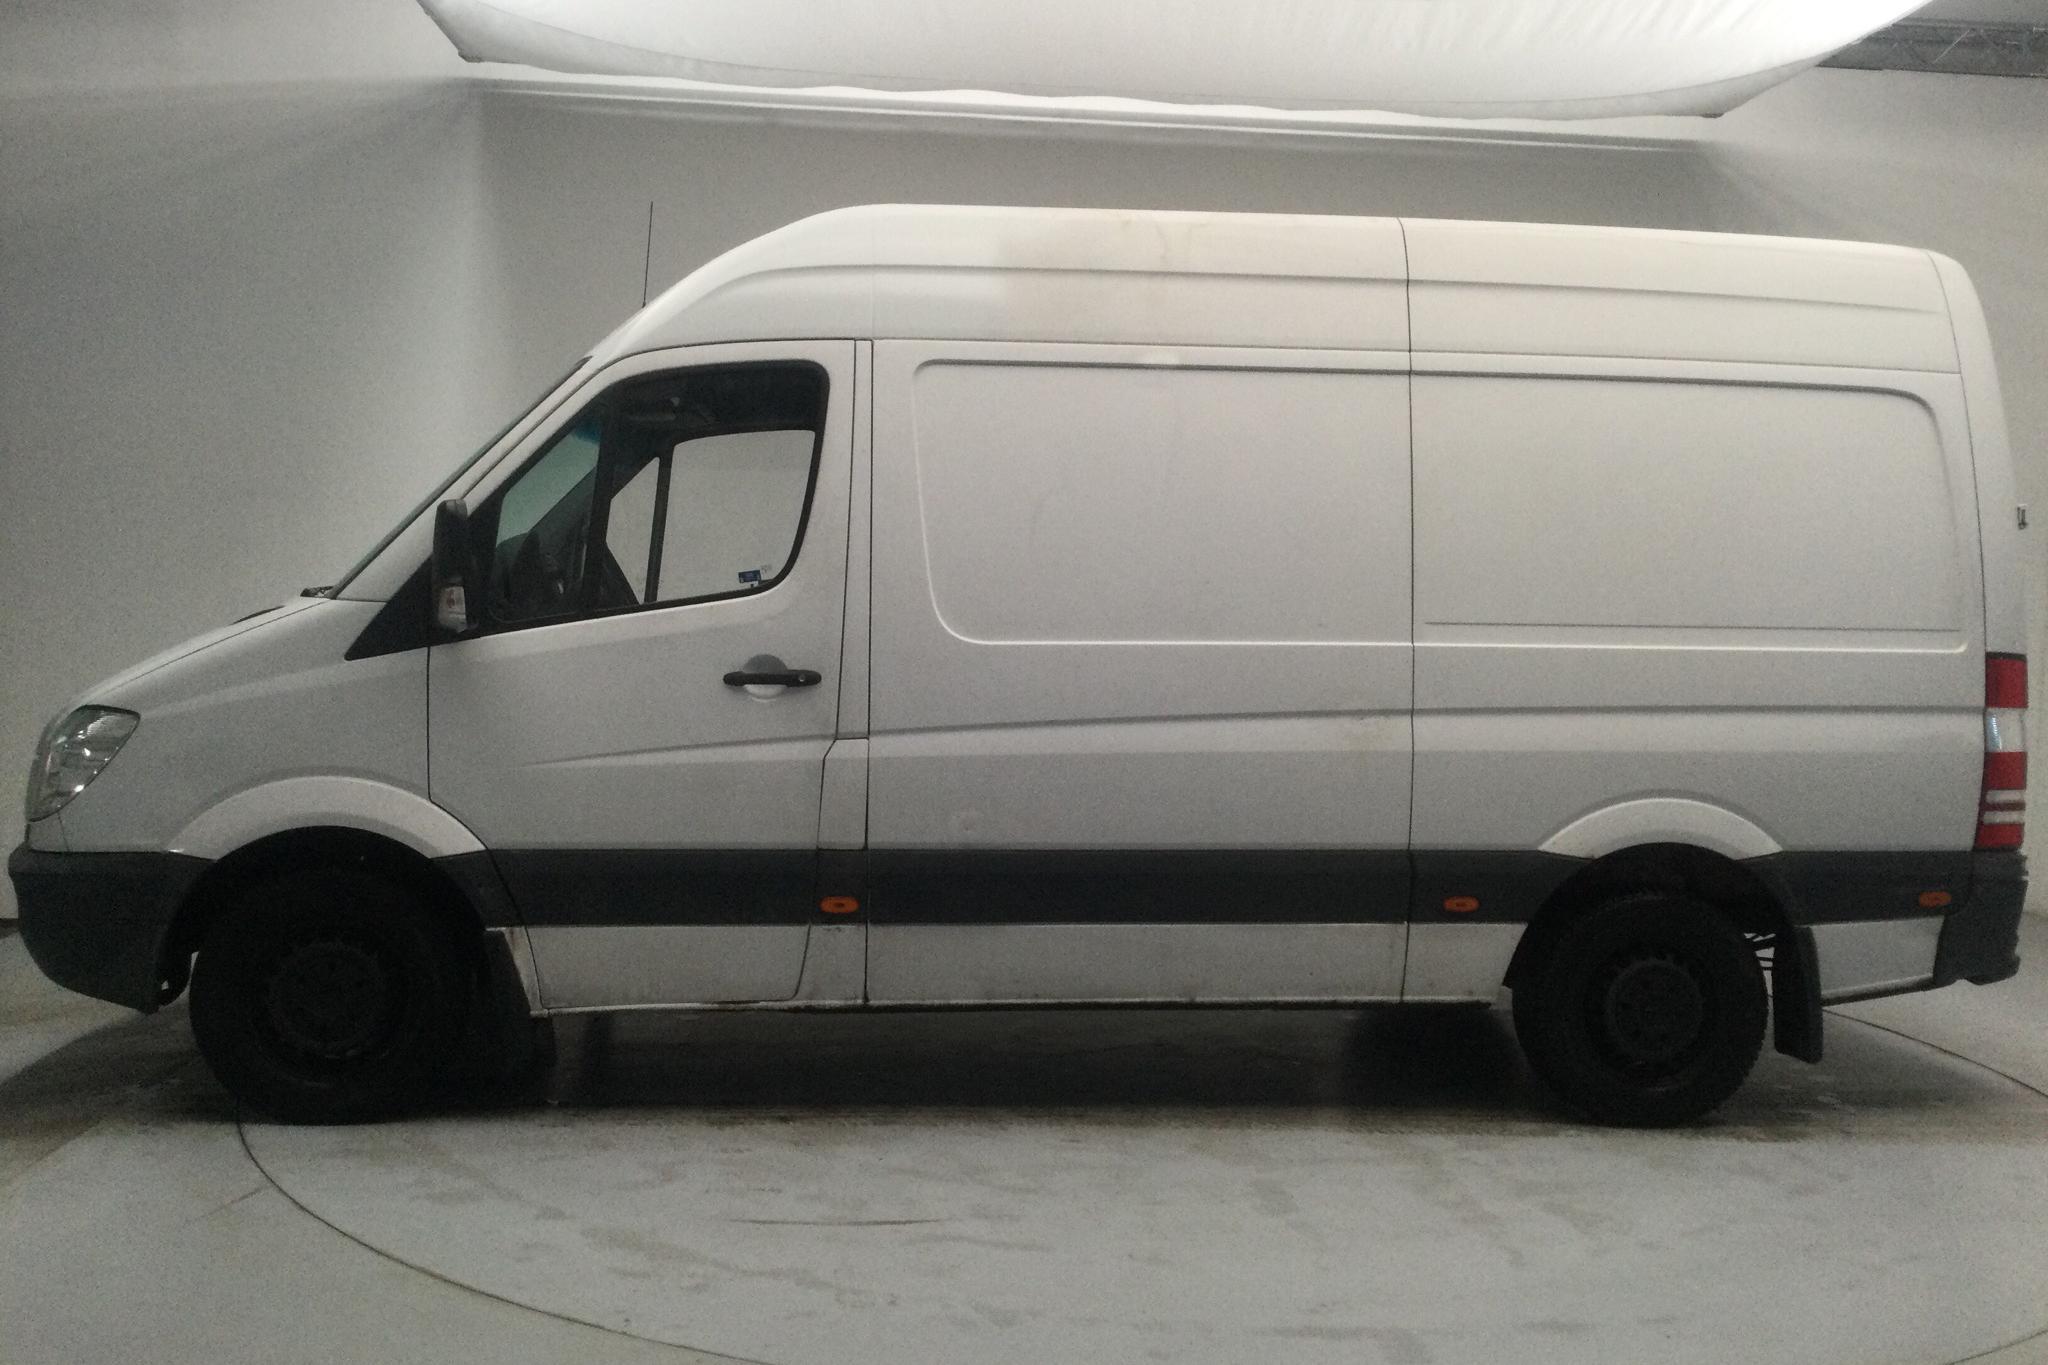 Mercedes Sprinter 316 CDI (163hk) - 297 800 km - Automatic - white - 2011